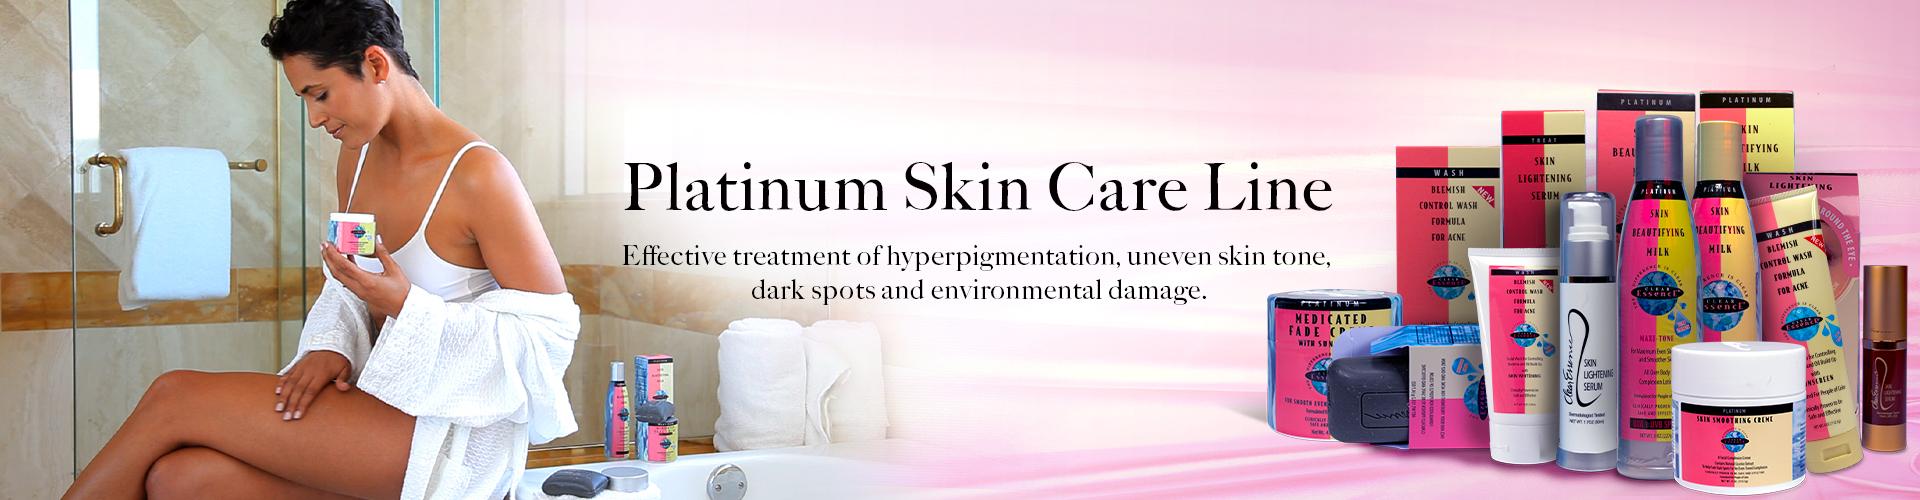 Clear Essence Platinum Skin Care Line